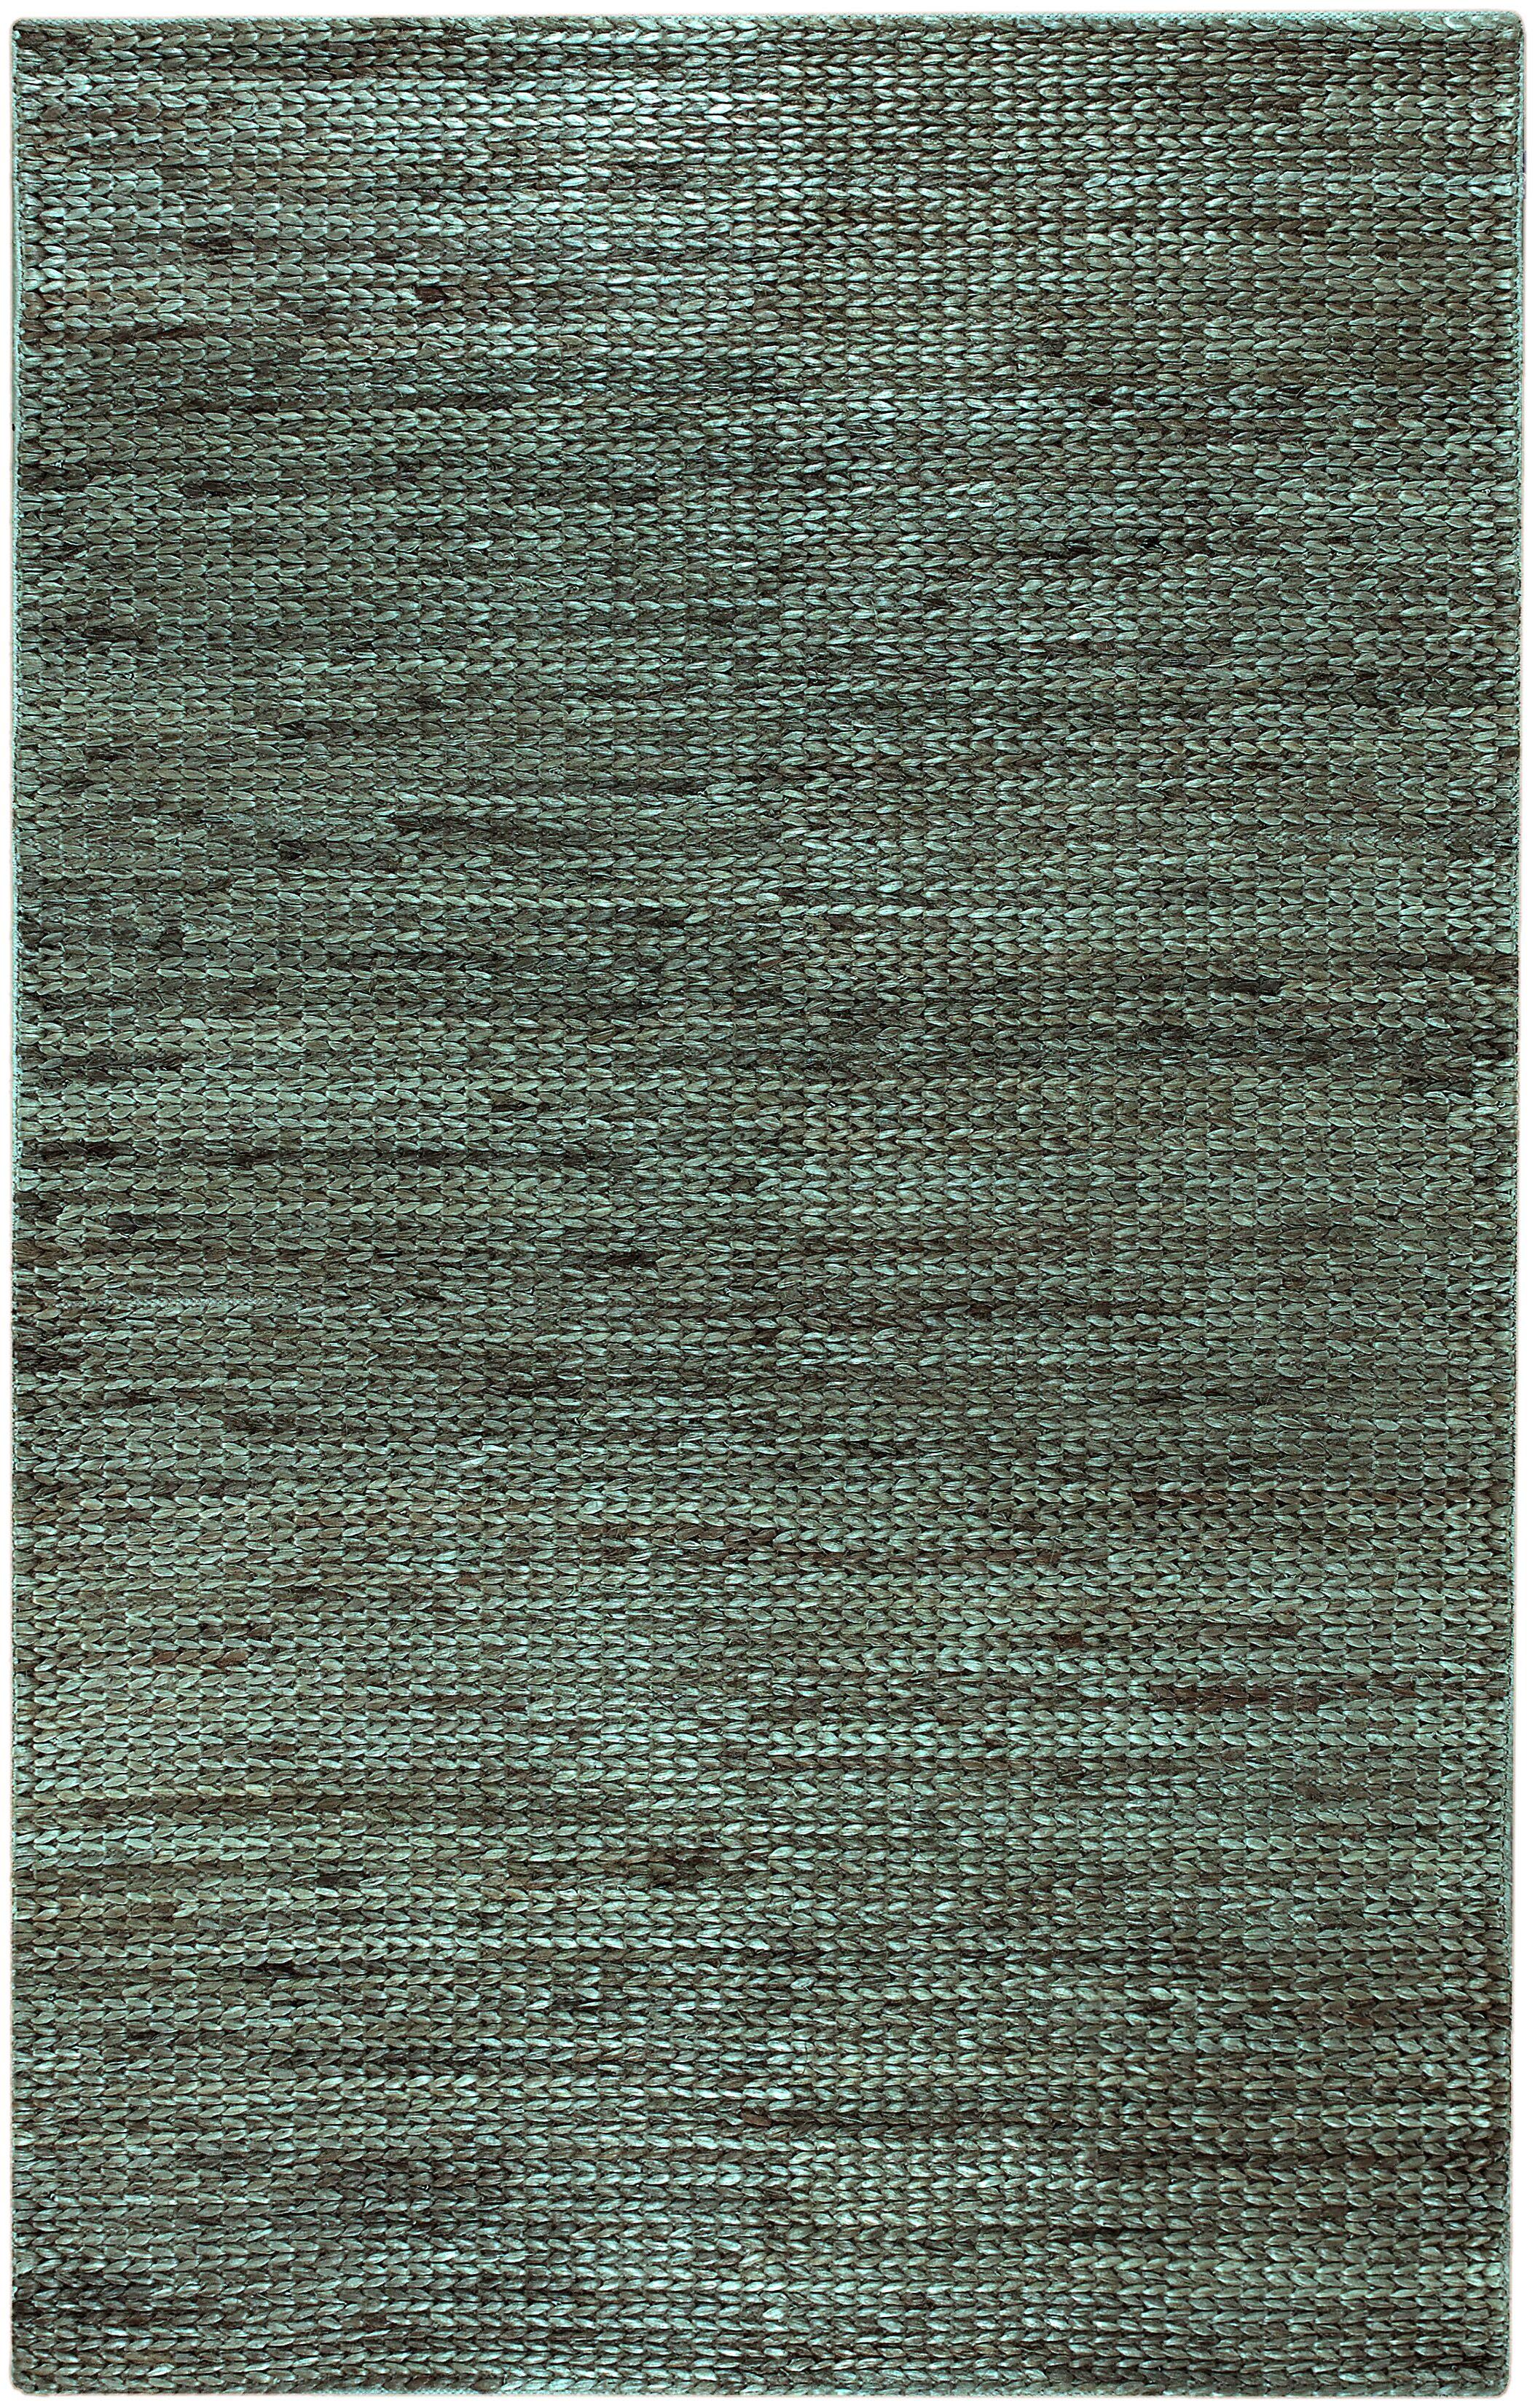 Tai Hand-Woven Moss Area Rug Rug Size: Rectangle 8' x 11'